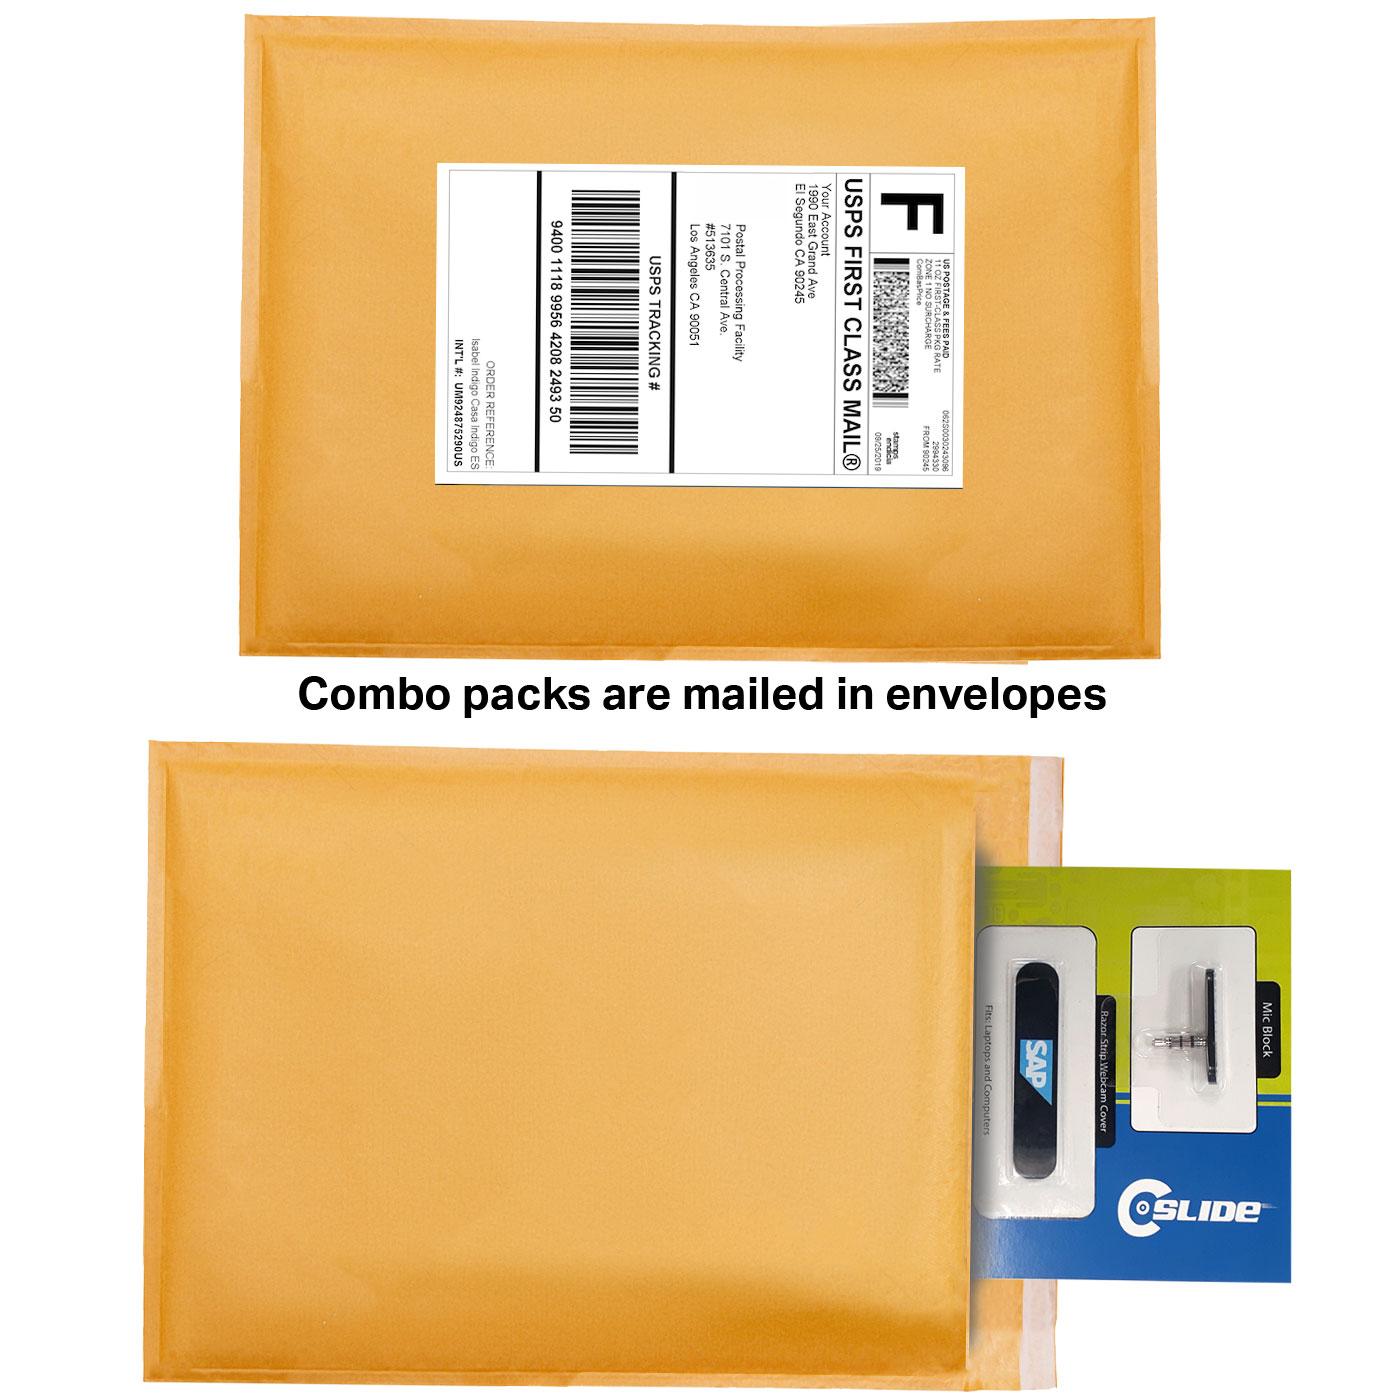 mailer-combo-packs